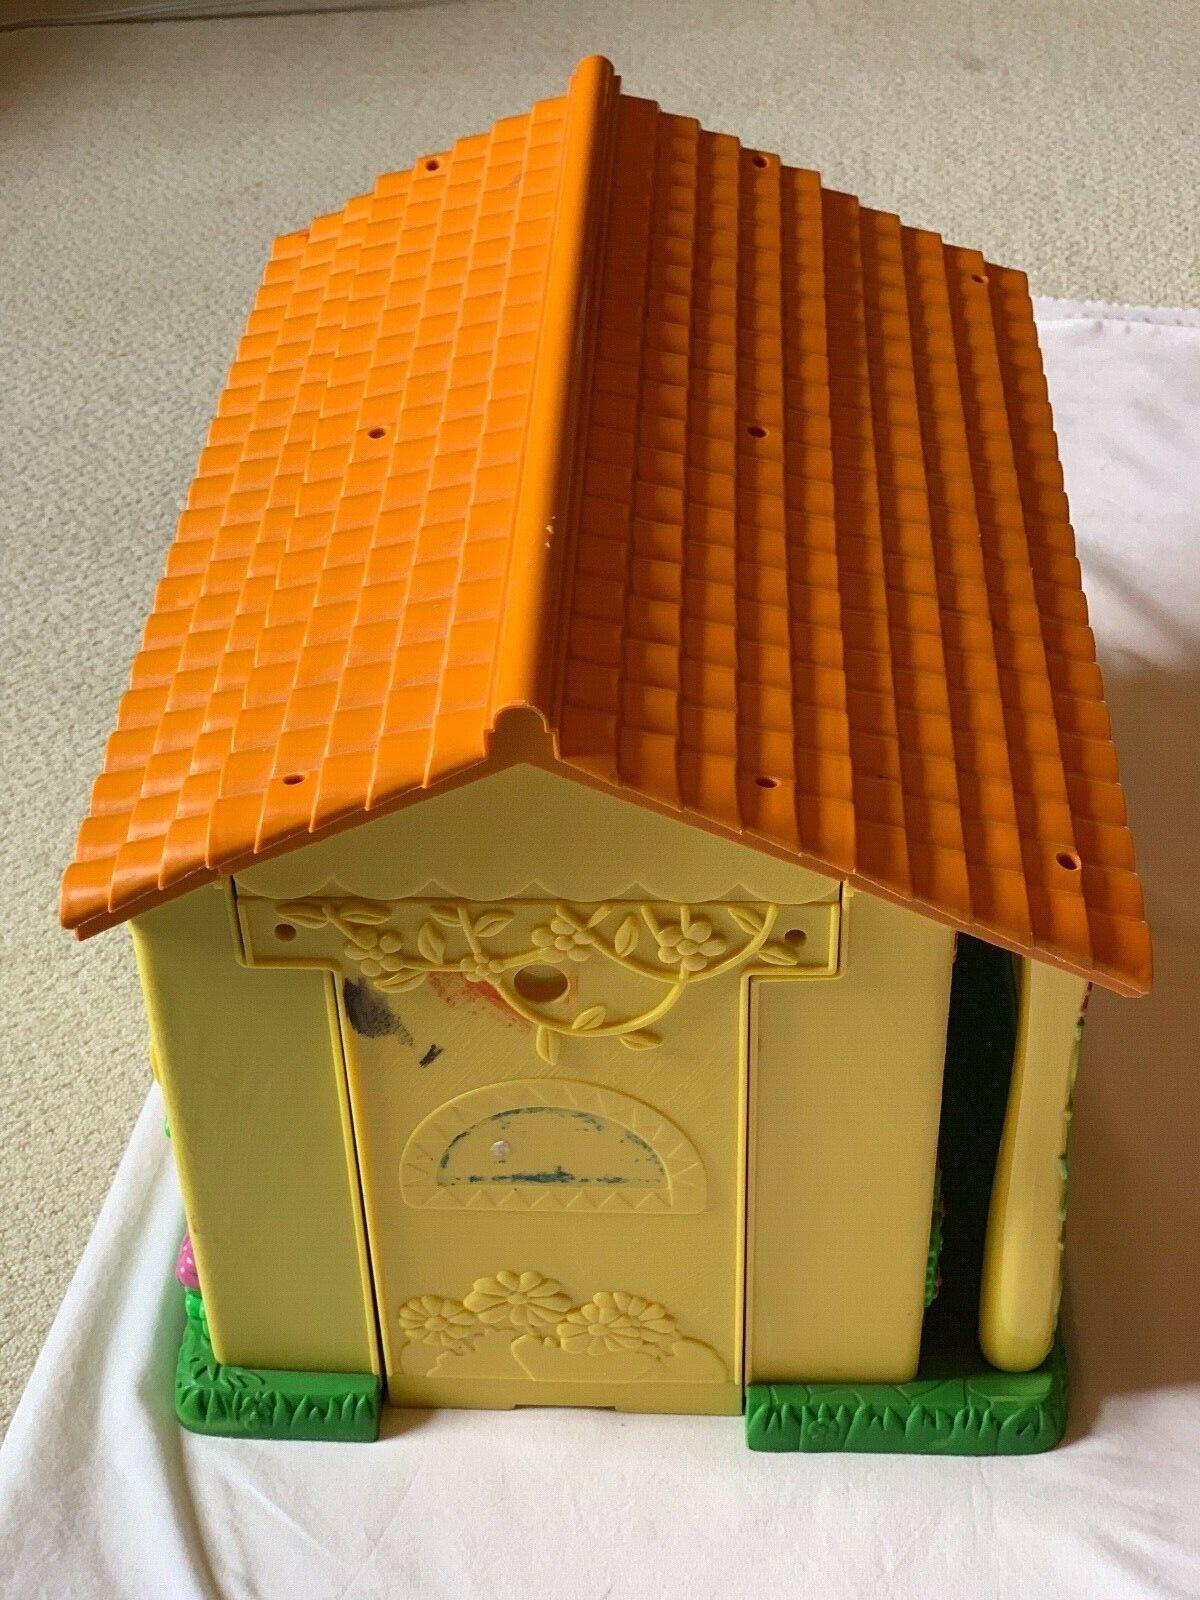 2003 Dora the Explorer Talking Dollhouse Pop Up Folding Doll Doll Doll House Play set 0d1d41